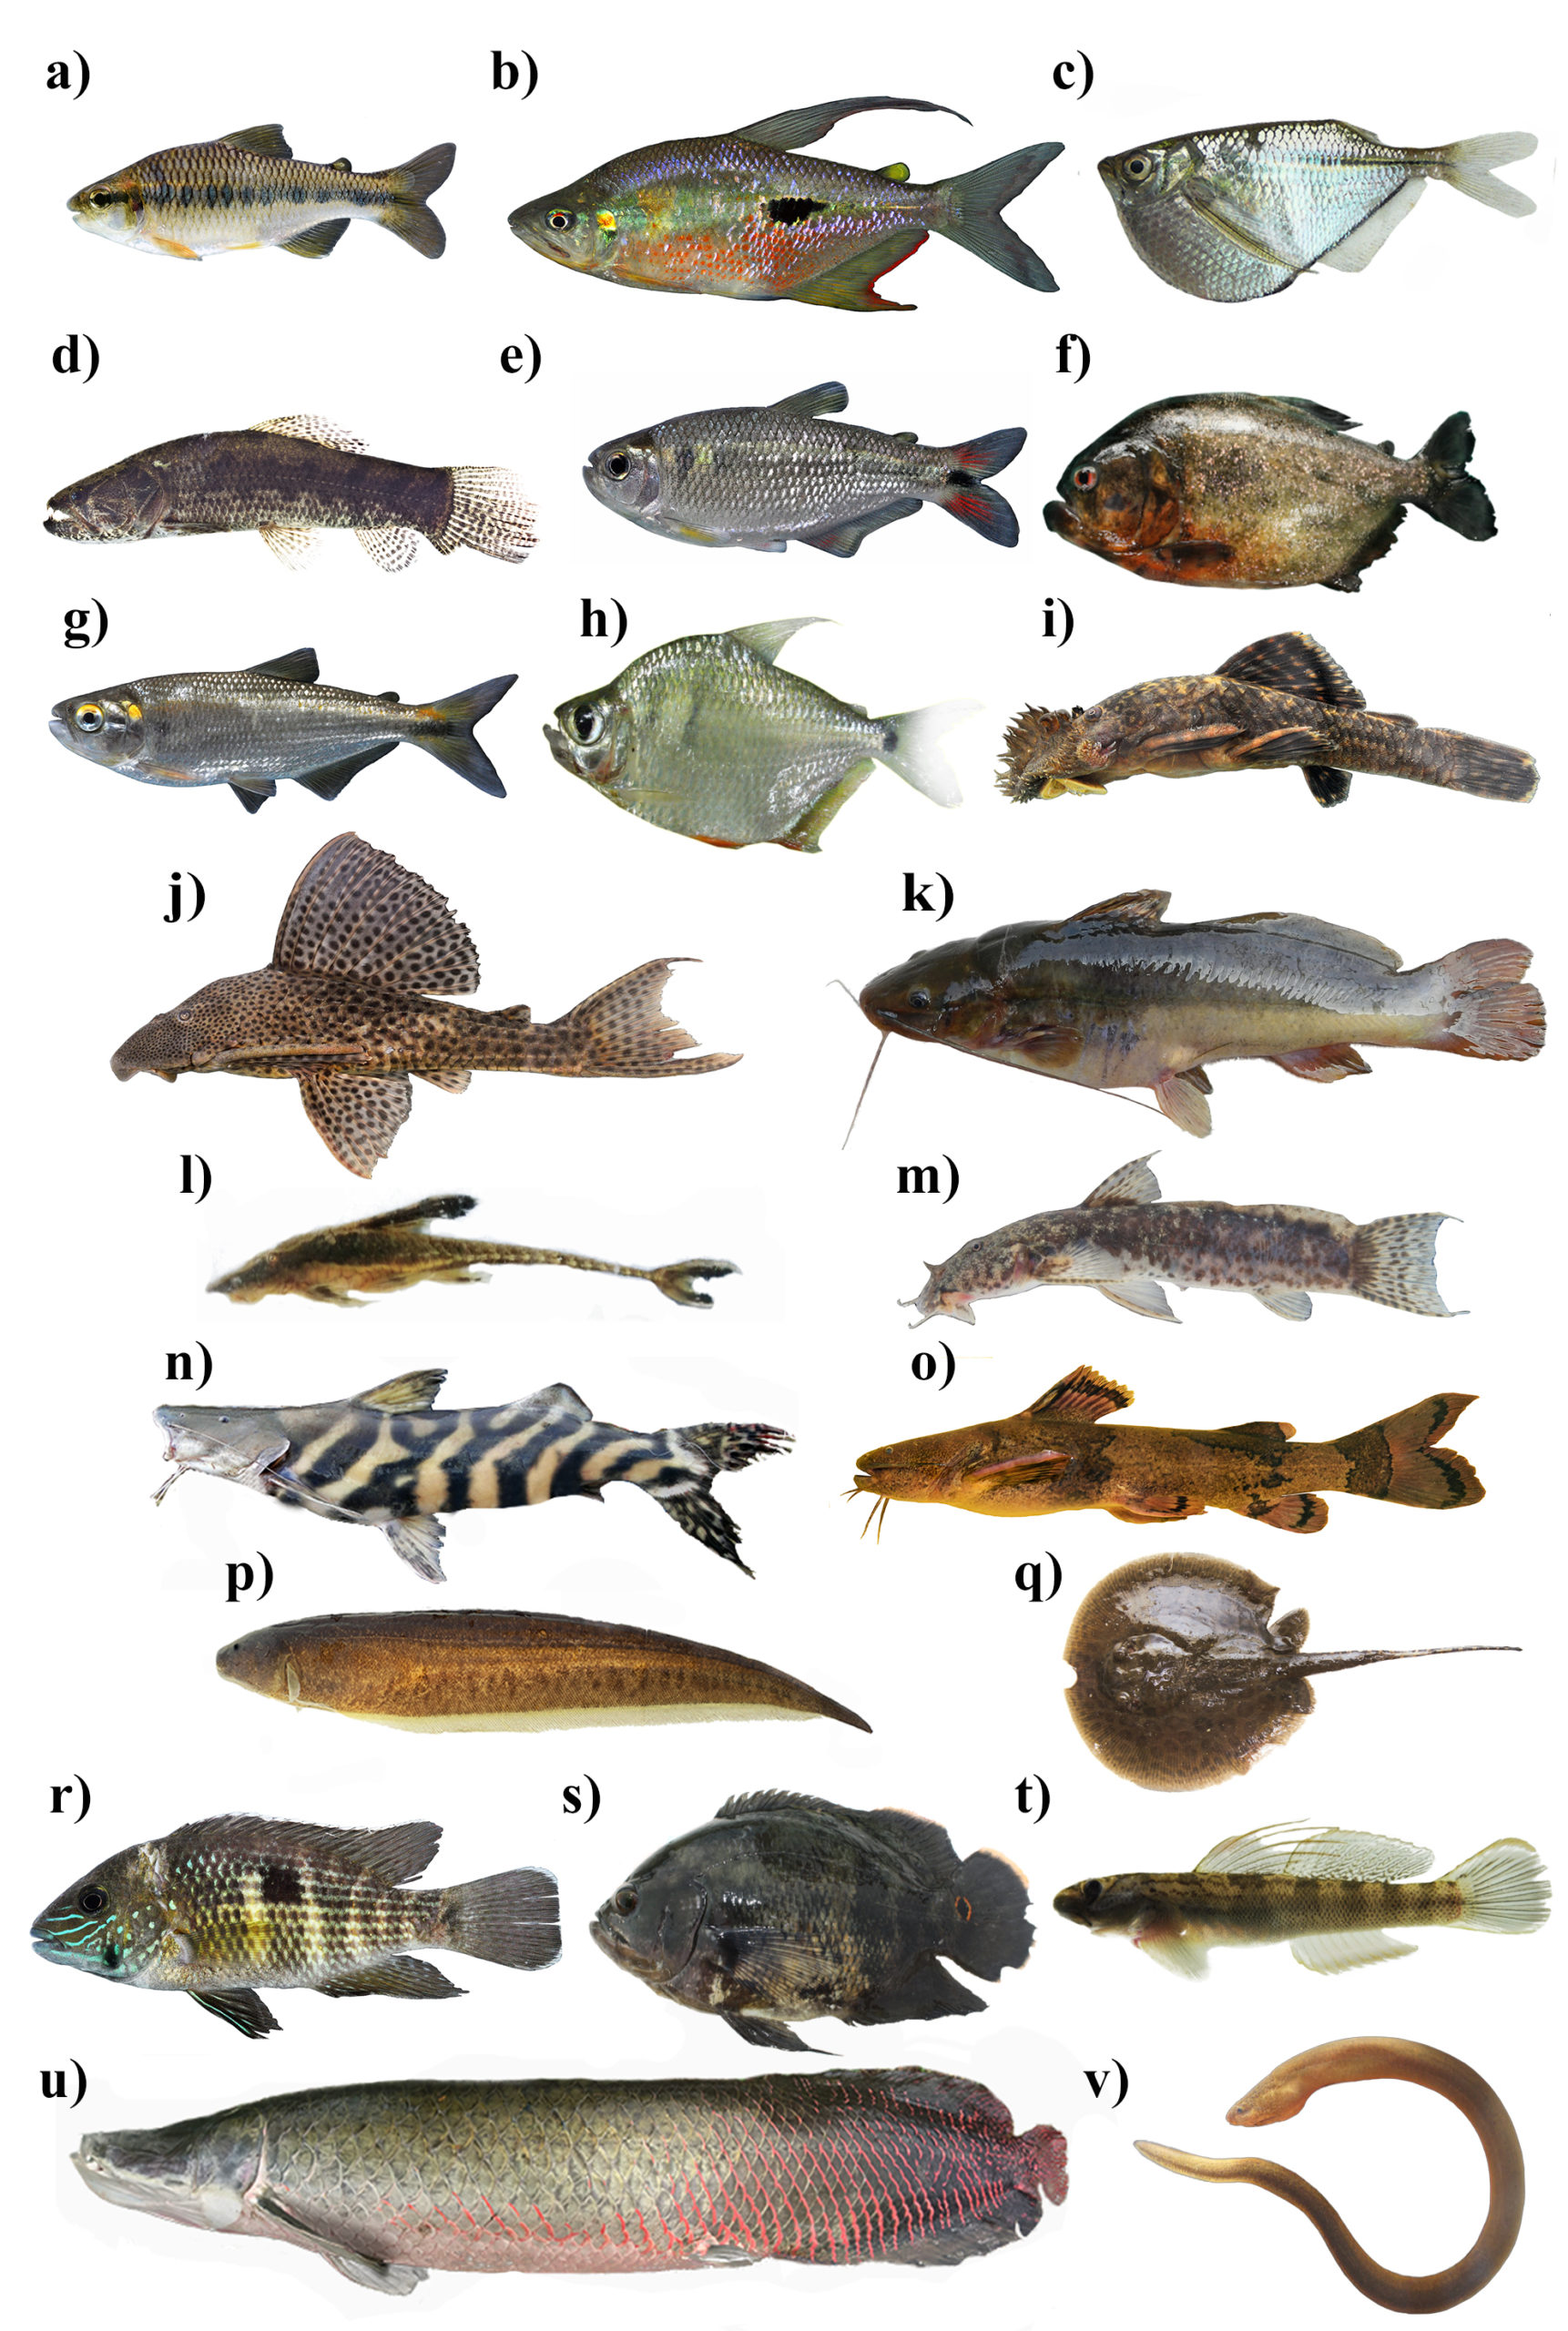 Peces de agua dulce ecuatorianos. (a) Creagrutus kunturus, (b) Rhoadsia menor, (c) Gasteropelecus maculatus, (d) Hoplias malabaricus, (e) Eretmobrycon sp., (f) Pygocentrus nattereri, (g) Brycon sp., (h) Tetragonopterus argenteus, (i) Ancistrus clementinae, (j) hipóstomo cf. niceforoi, (k) Rhamdia cinerascens, (l) Sturisomatichthys frenatus, (m) Astroblepus sp., (N) Brachyplatystoma juruense, (o) Pseudopimelodus bufonius, (p) Brachyhypopomus palenque, (q) Potamotrygon motoro, (r) Andinoacara rivulatus, (s) Astronotus ocellatus, (t) Sicydium sp., (U) Arapaima gigas, (v) Synbranchus marmoratus.